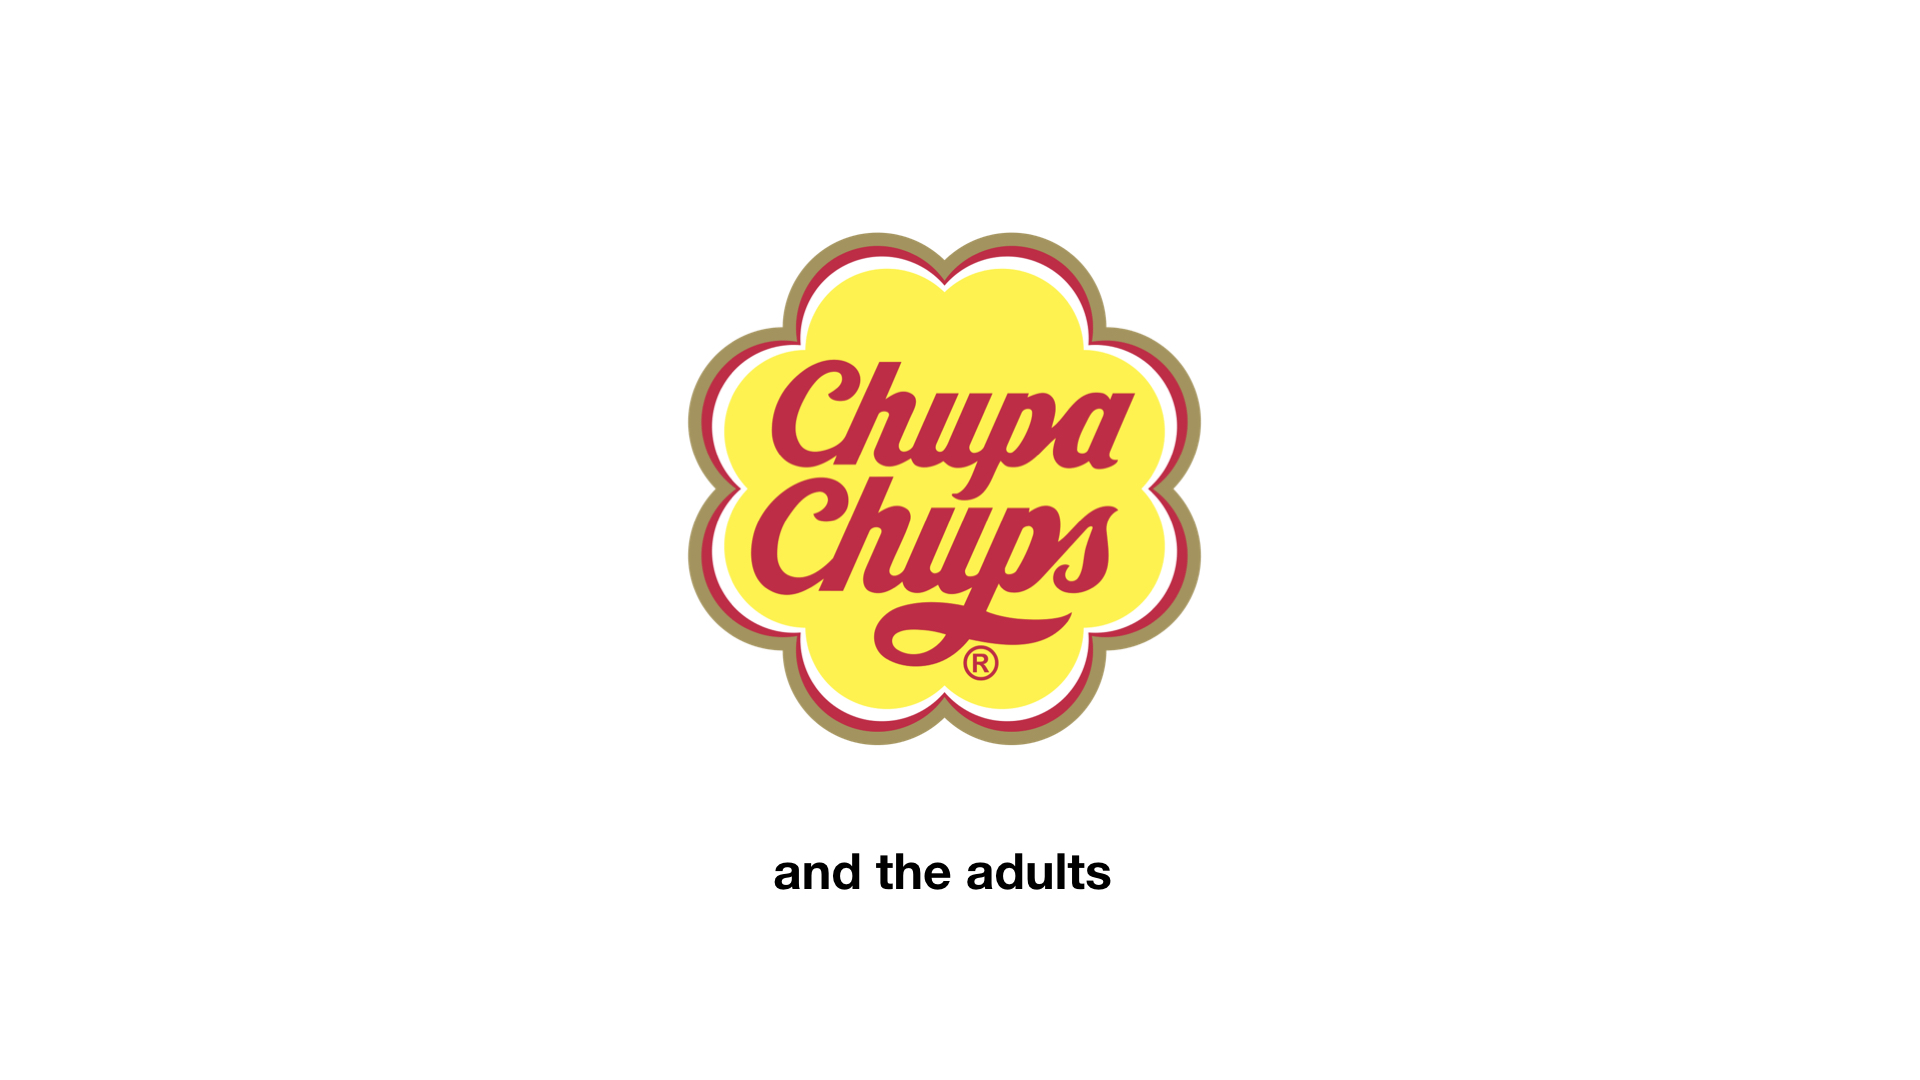 Chupa Chups wants to increase its brand equity among adults.